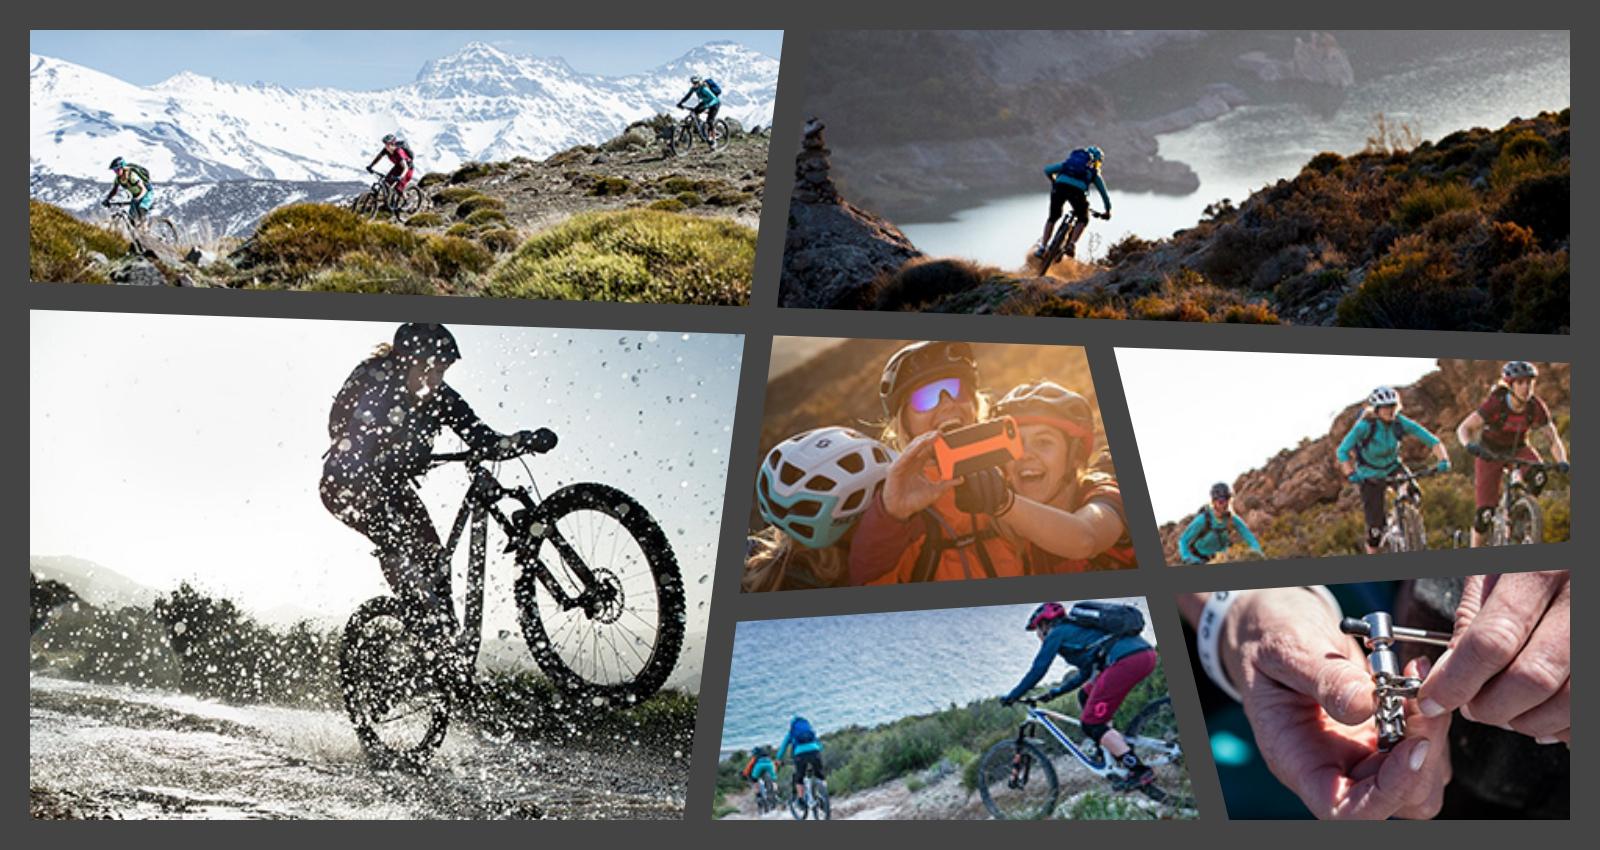 outdoor-femmes-rideuses-mountain-bike-montagne-sorties-filles-aventure-espace-nature